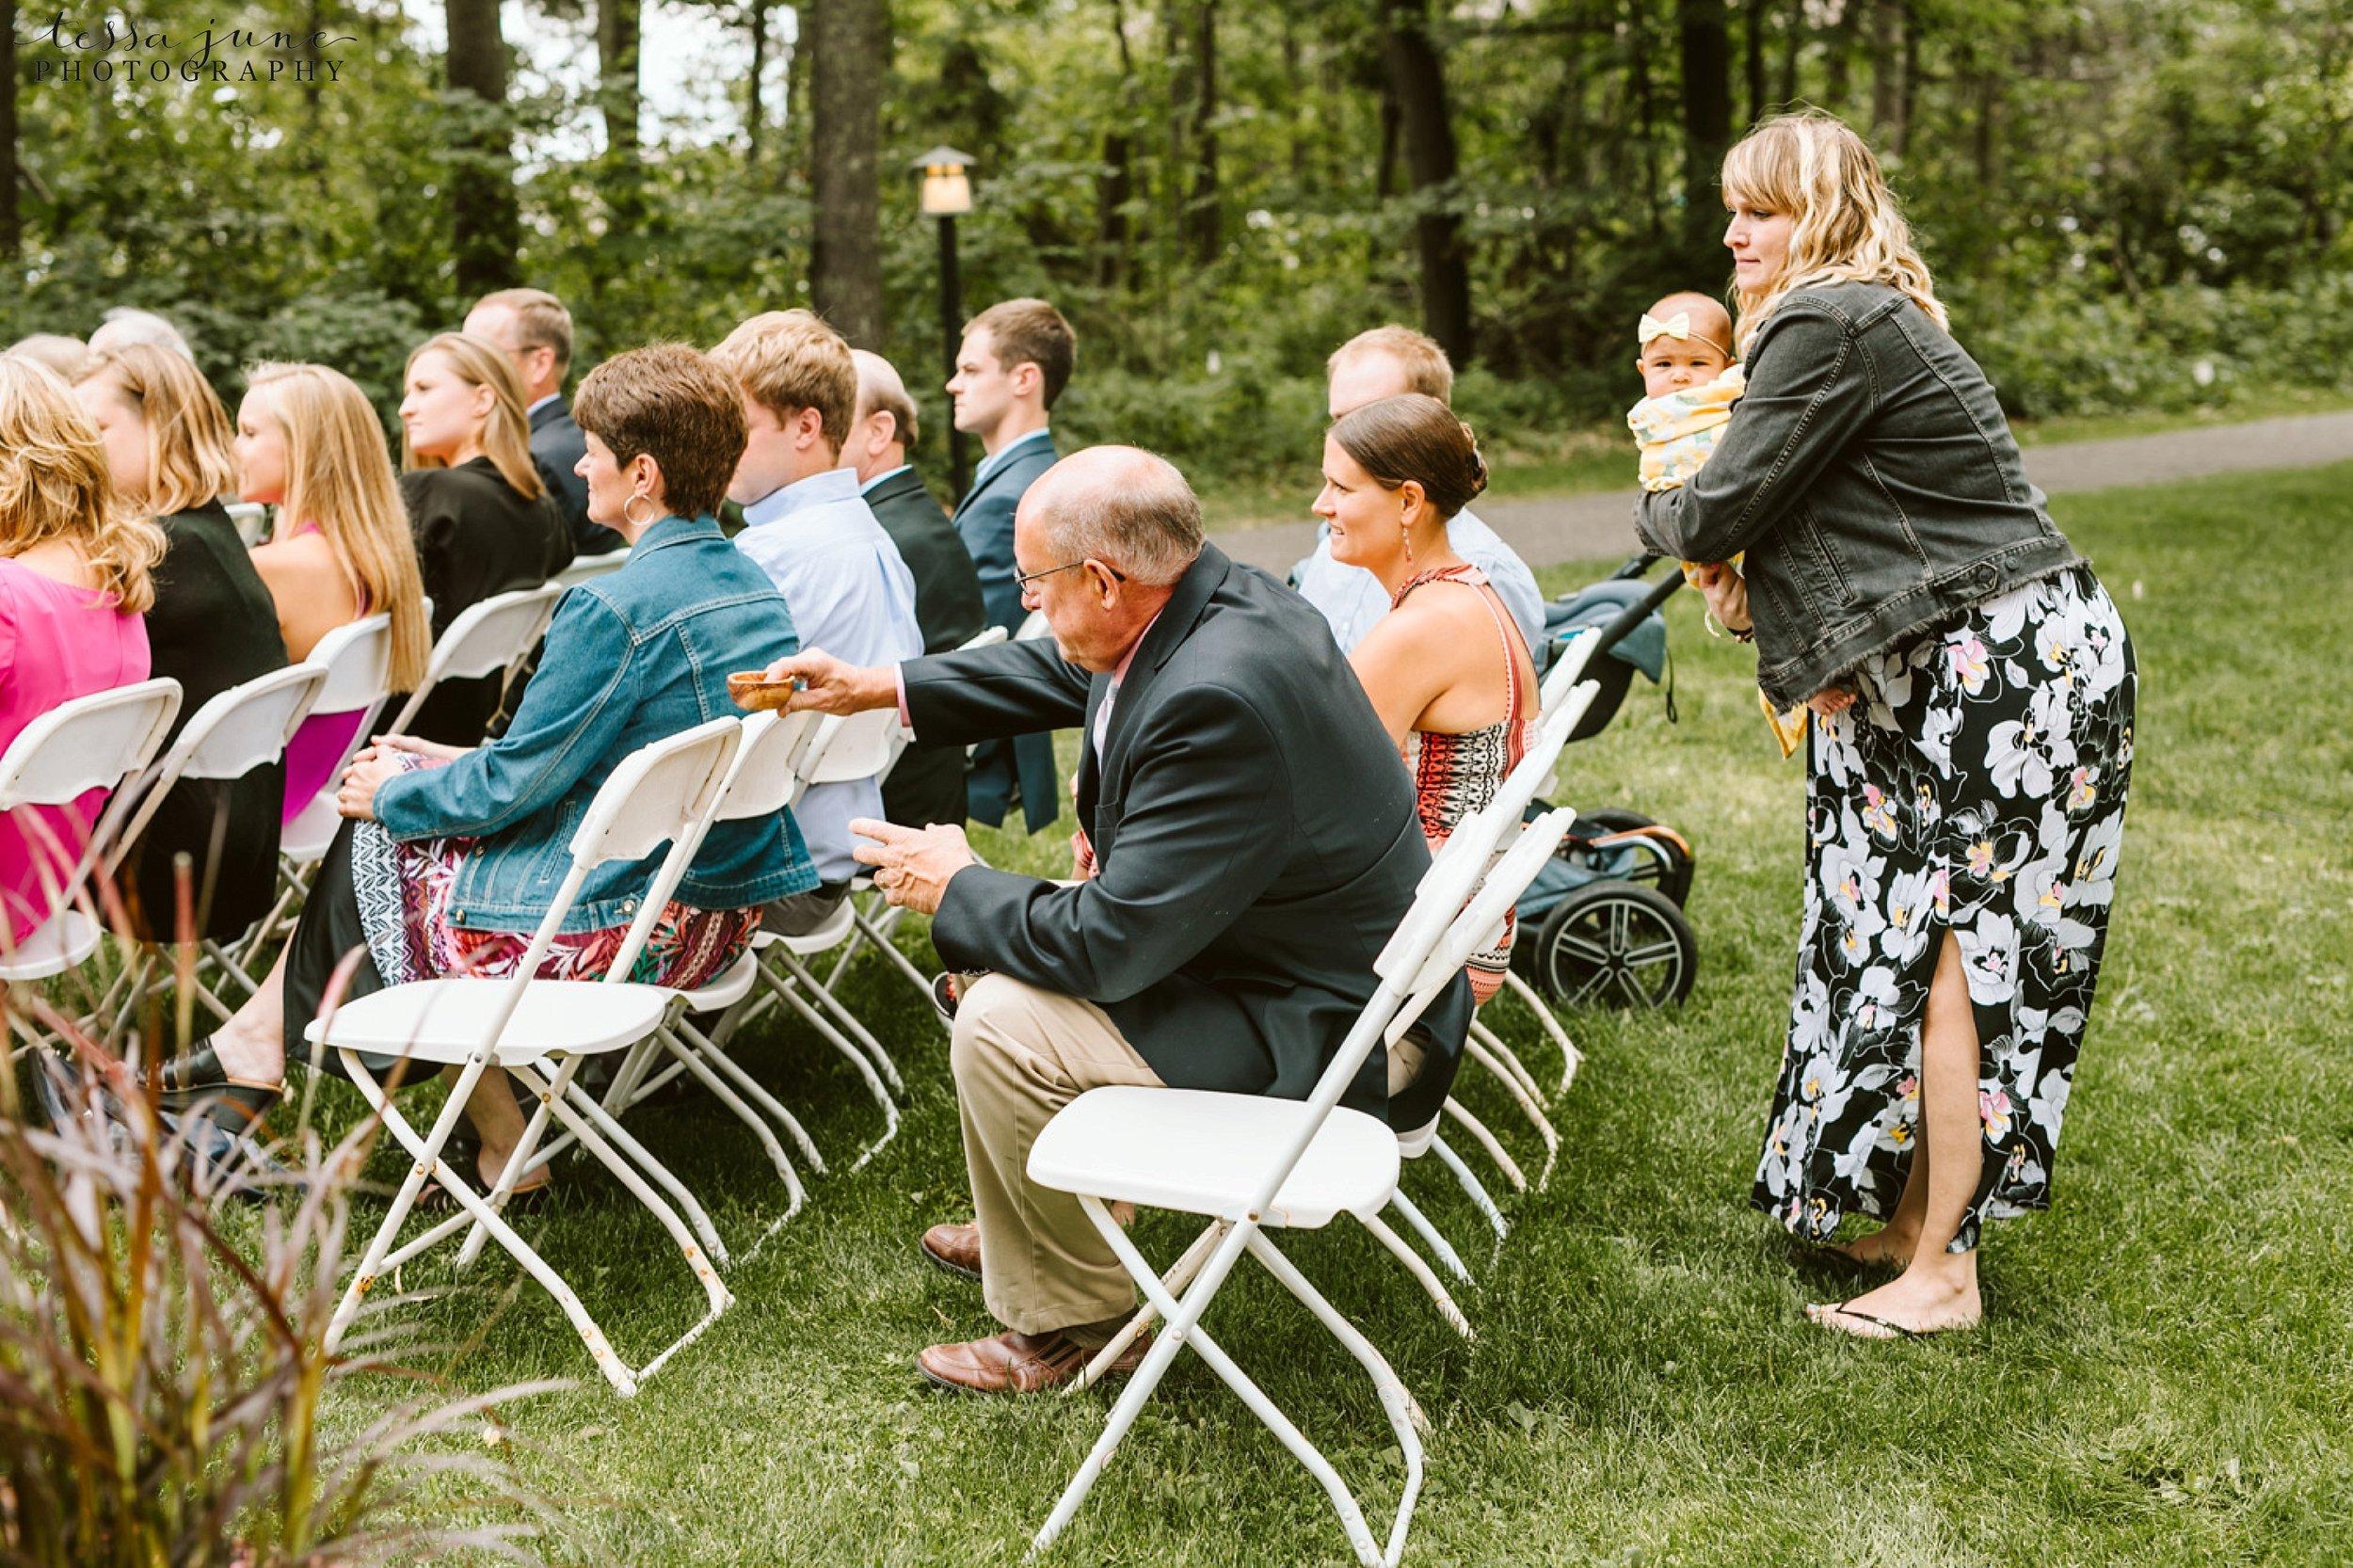 grandview-lodge-intimate-wedding-nisswa-minnesota_0054.jpg